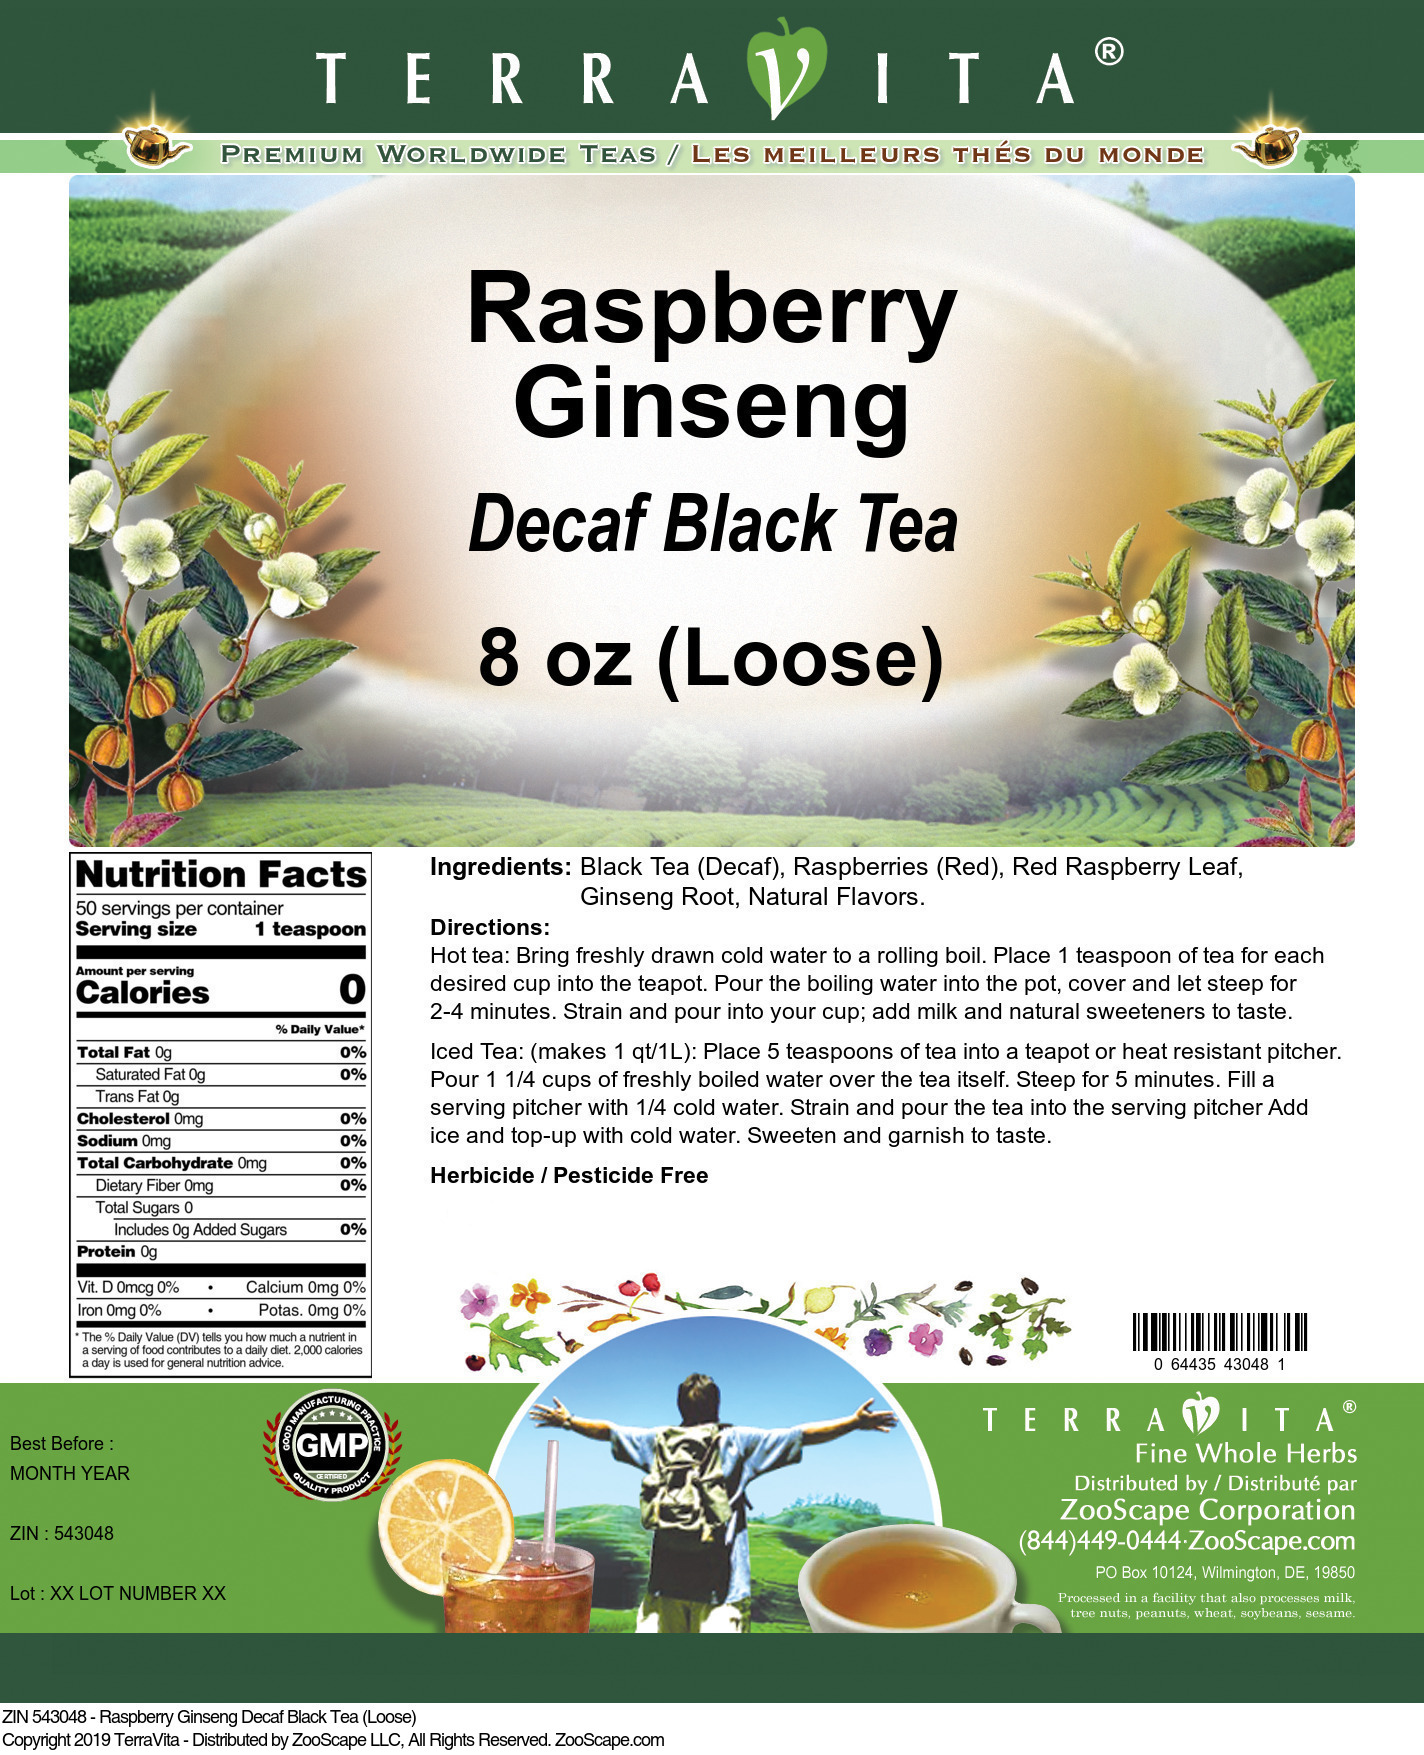 Raspberry Ginseng Decaf Black Tea (Loose)